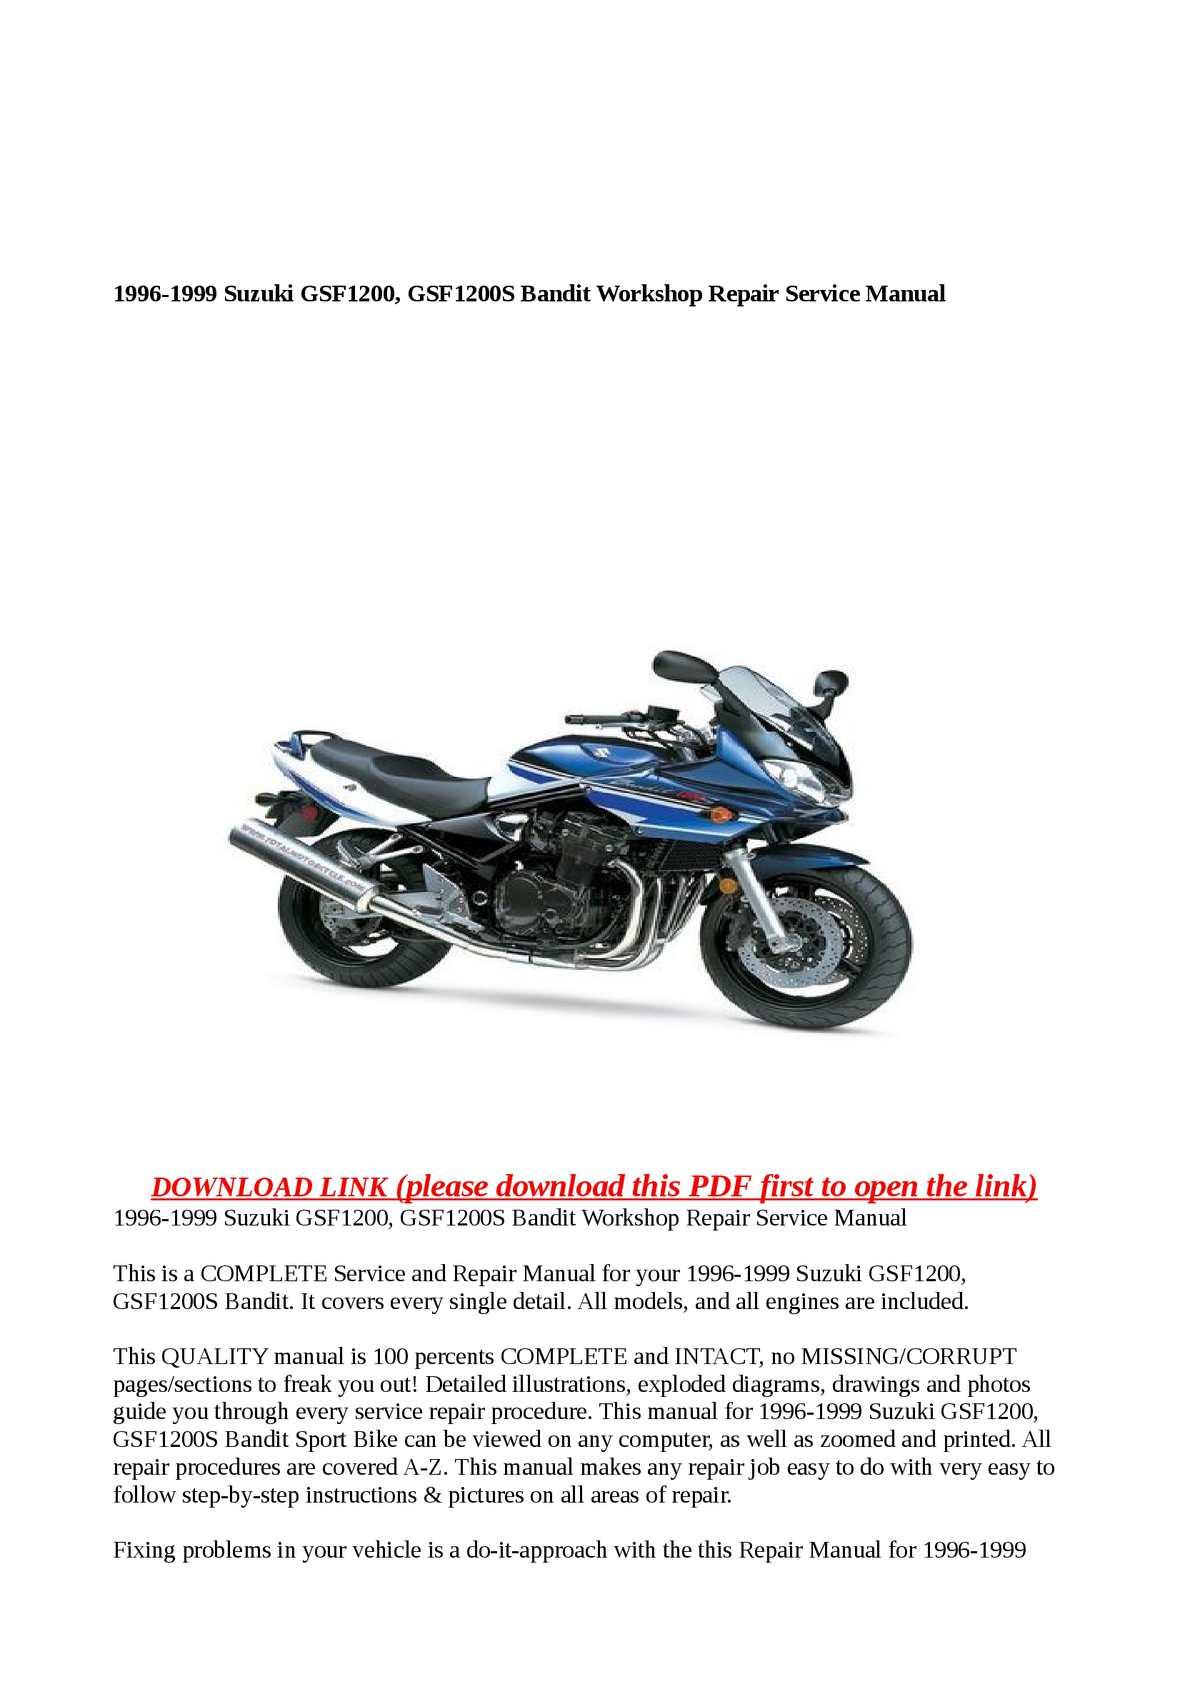 Calaméo - 1996-1999 Suzuki GSF1200, GSF1200S Bandit Workshop Repair Service  Manual